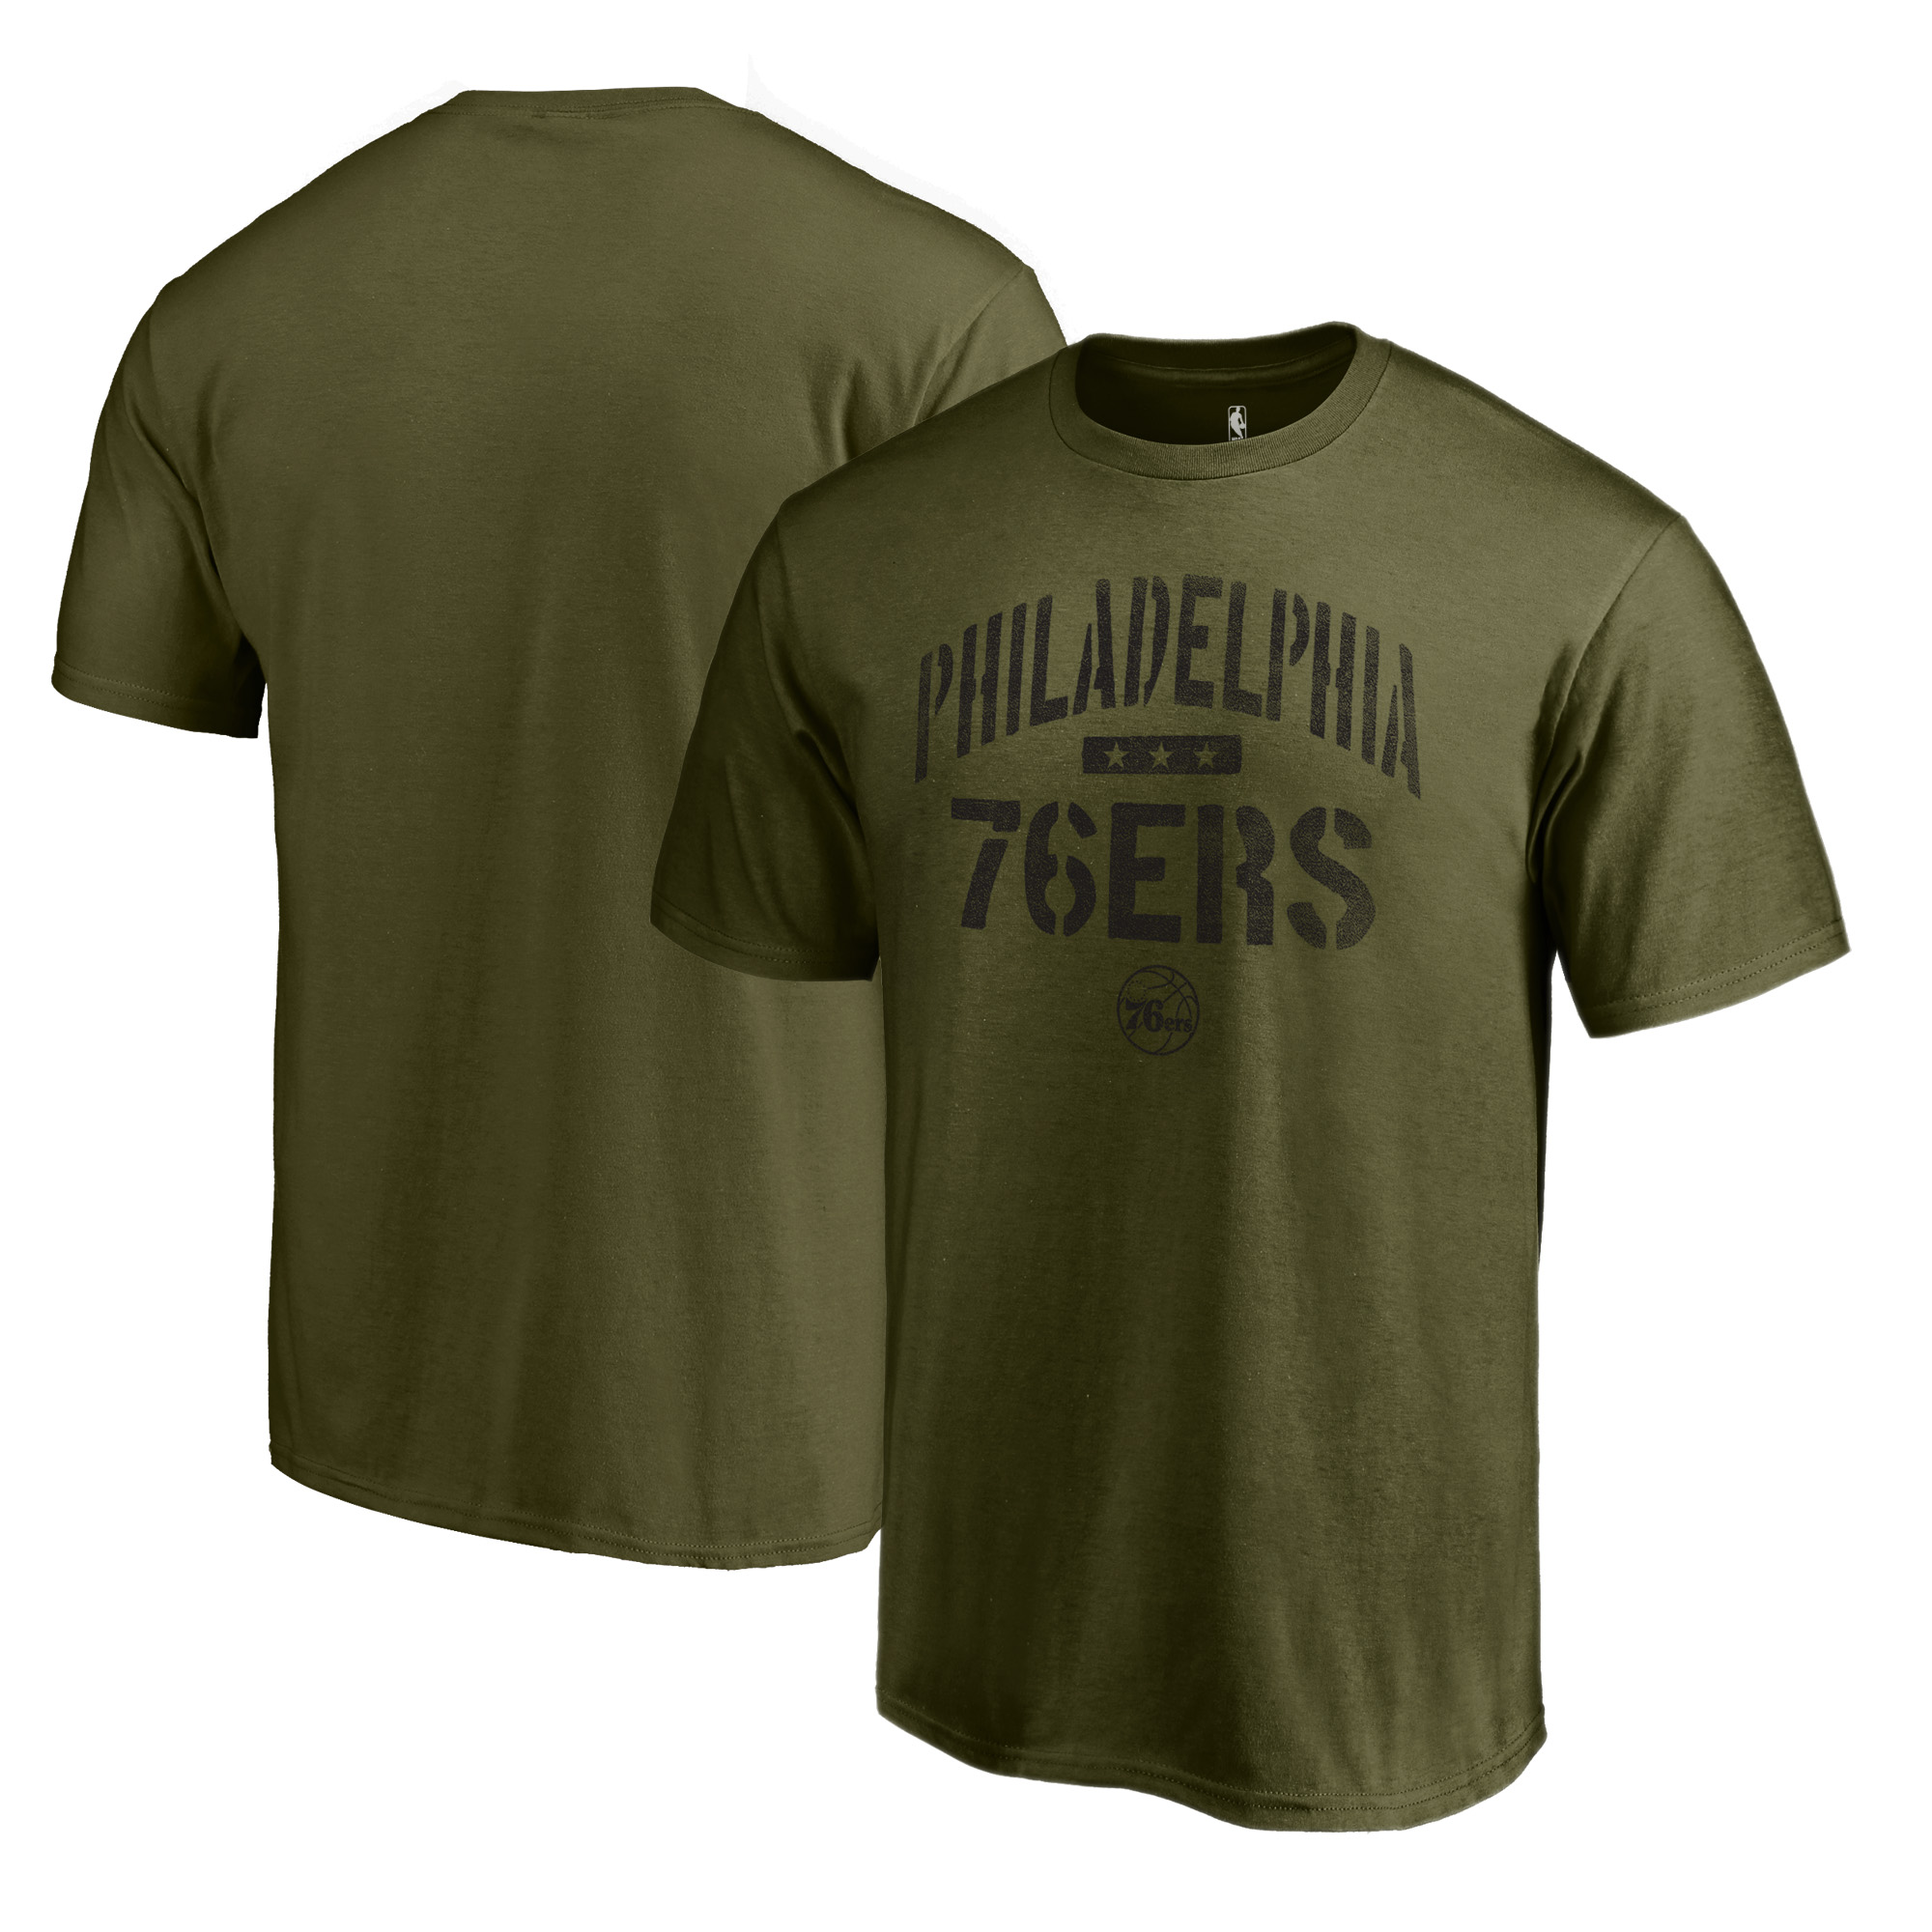 Philadelphia 76ers Fanatics Branded Camo Collection Jungle T-Shirt - Green